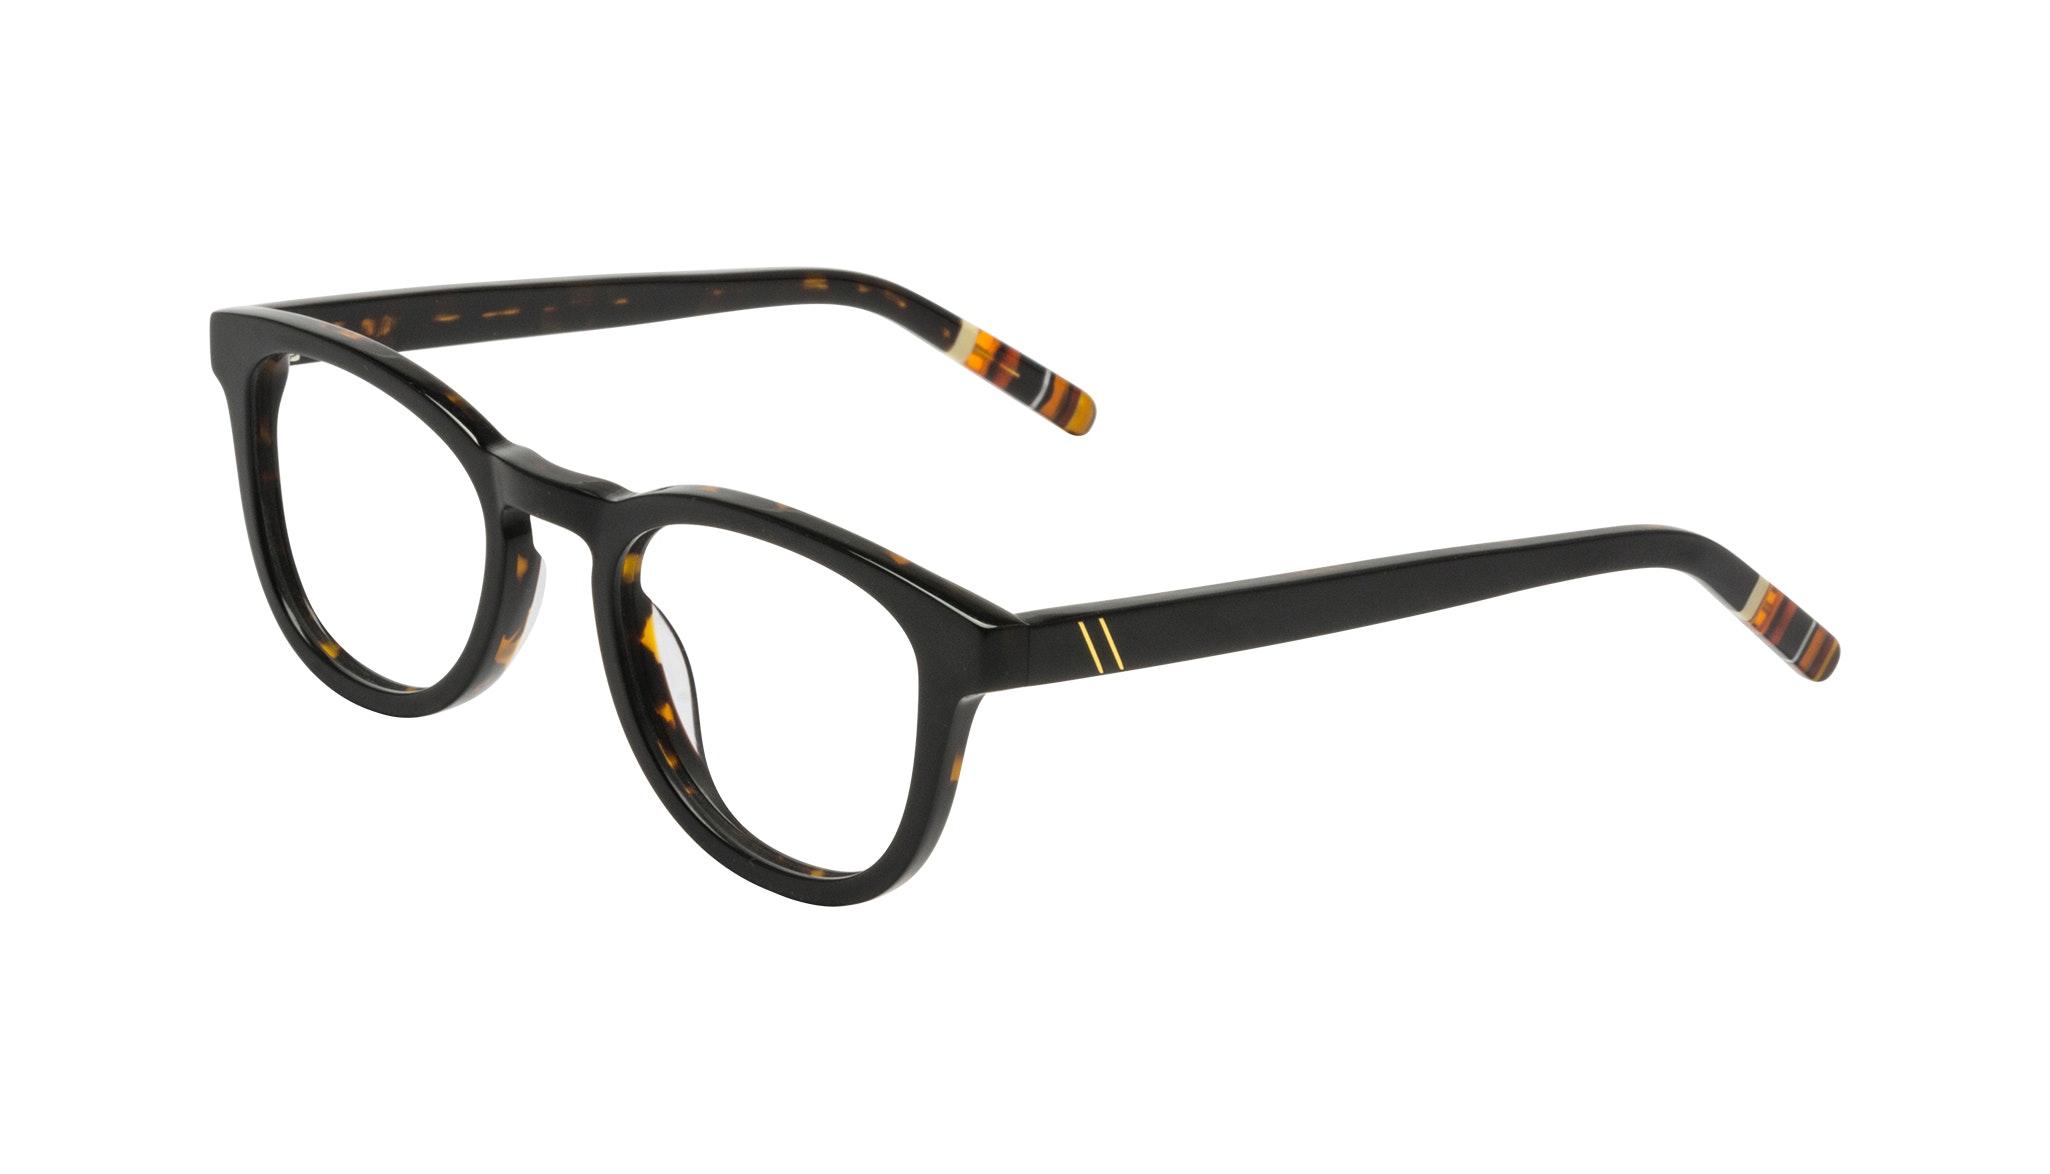 Affordable Fashion Glasses Round Eyeglasses Men Goal Black Tort Tilt